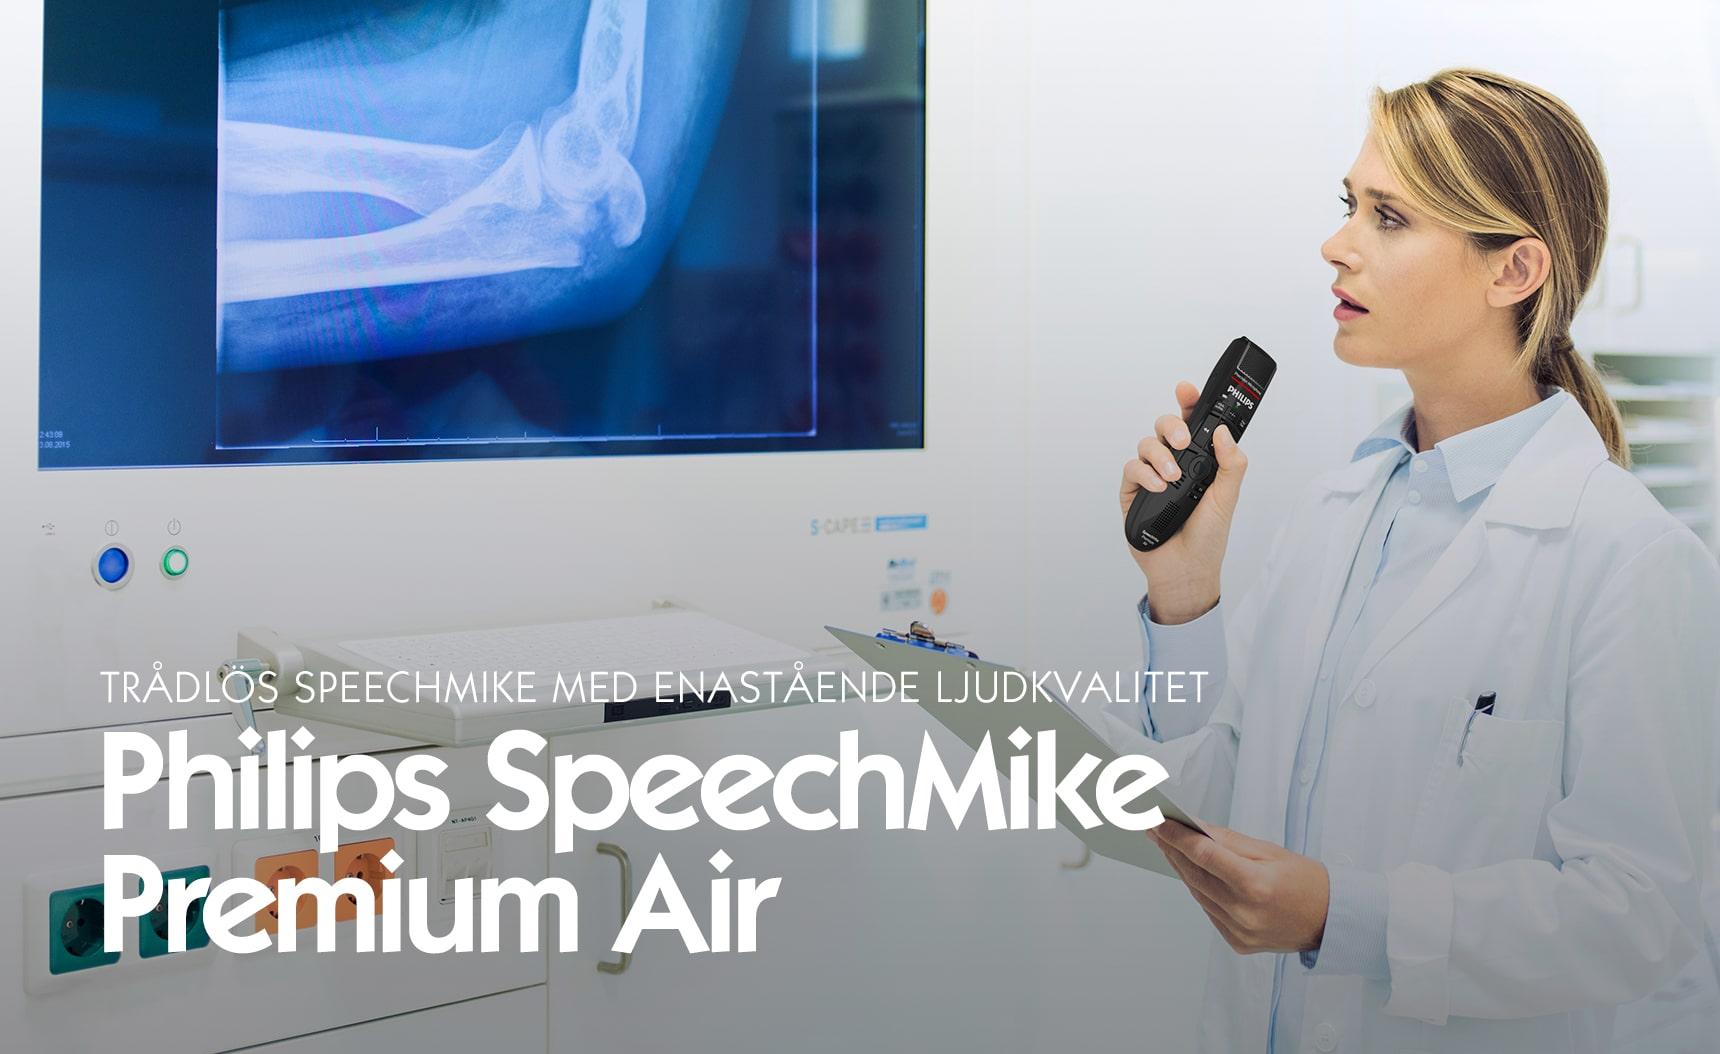 Trådlös SpeechMike med enastående ljudkvalitet - Premium Air